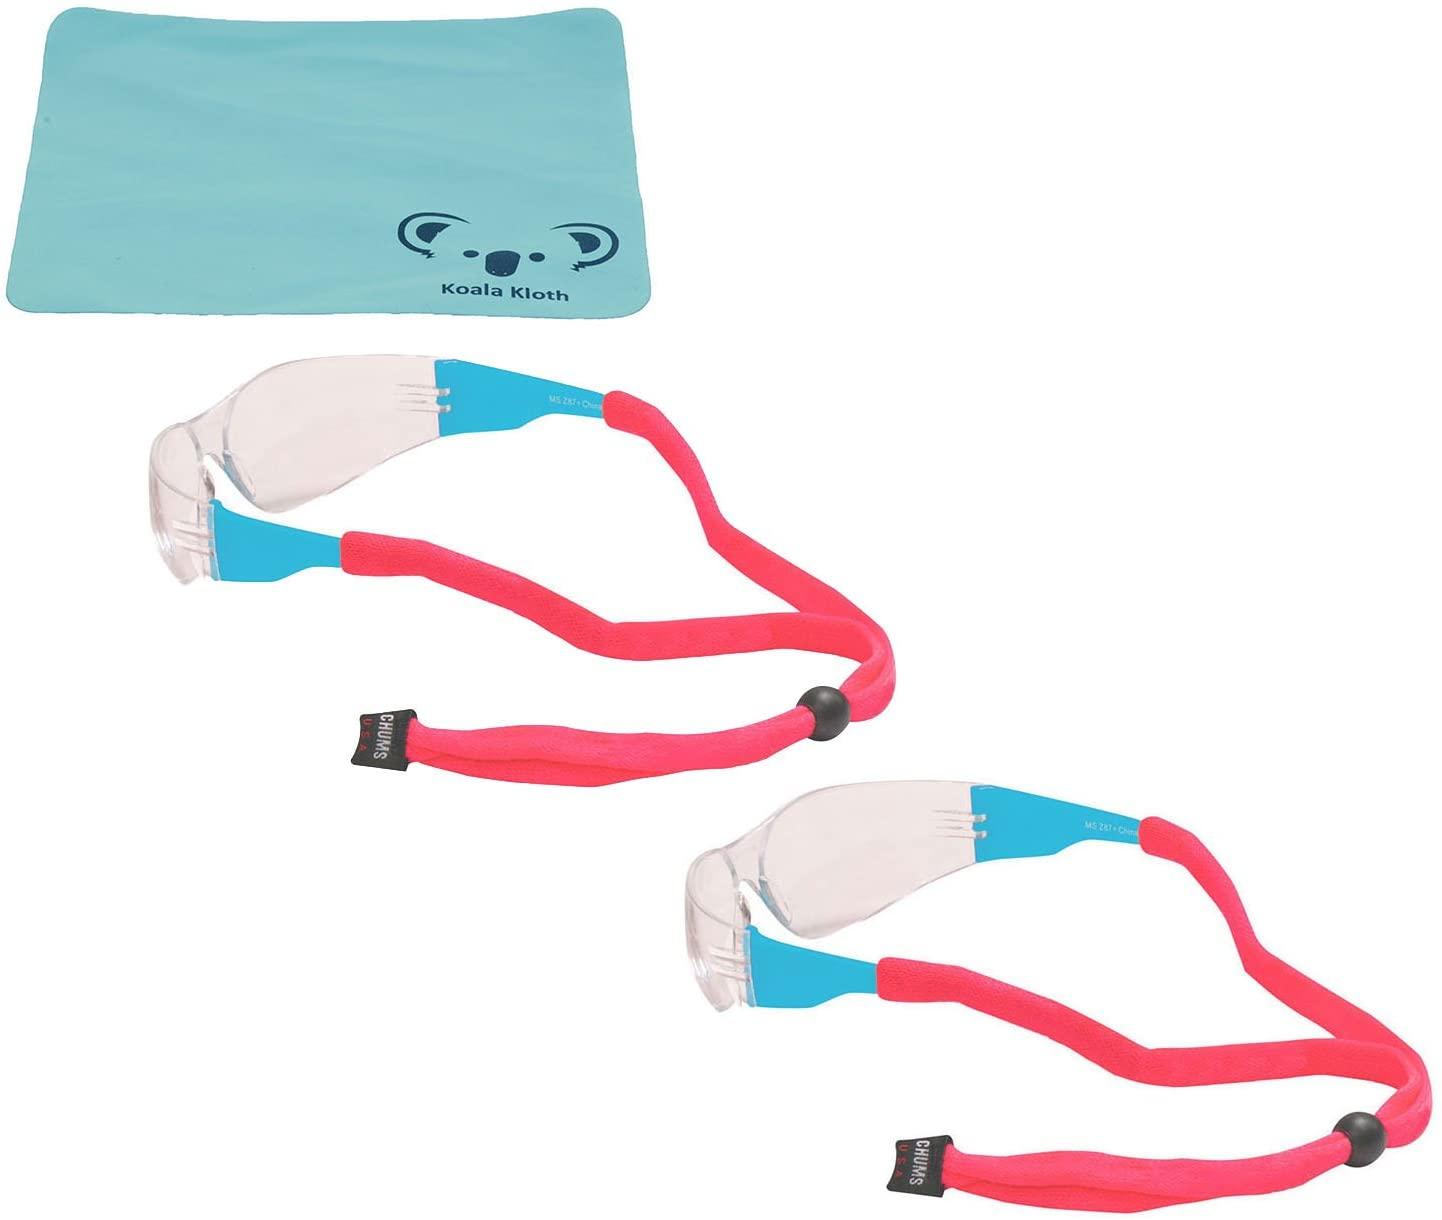 Chums Original Cotton Eyewear Retainer Sunglass Strap | Adjustable Eyeglass & Sports Glasses Holder Keeper Lanyard | 2pk Bundle + Cloth, Pink